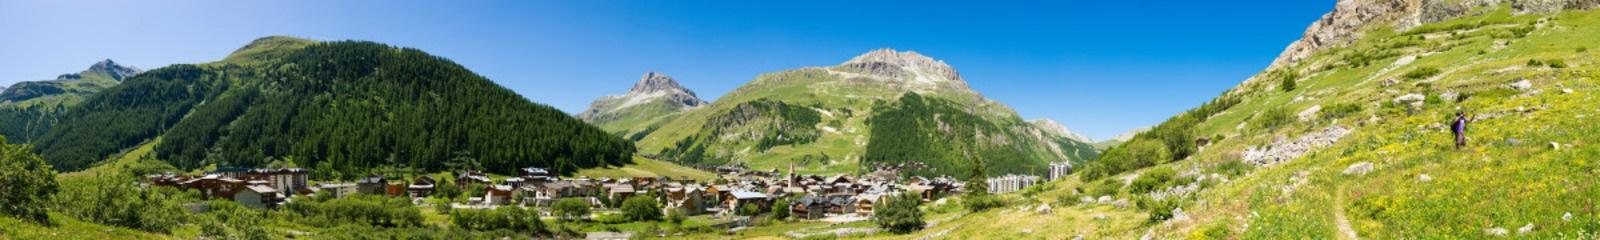 © Val d'Isère AndyParant.com